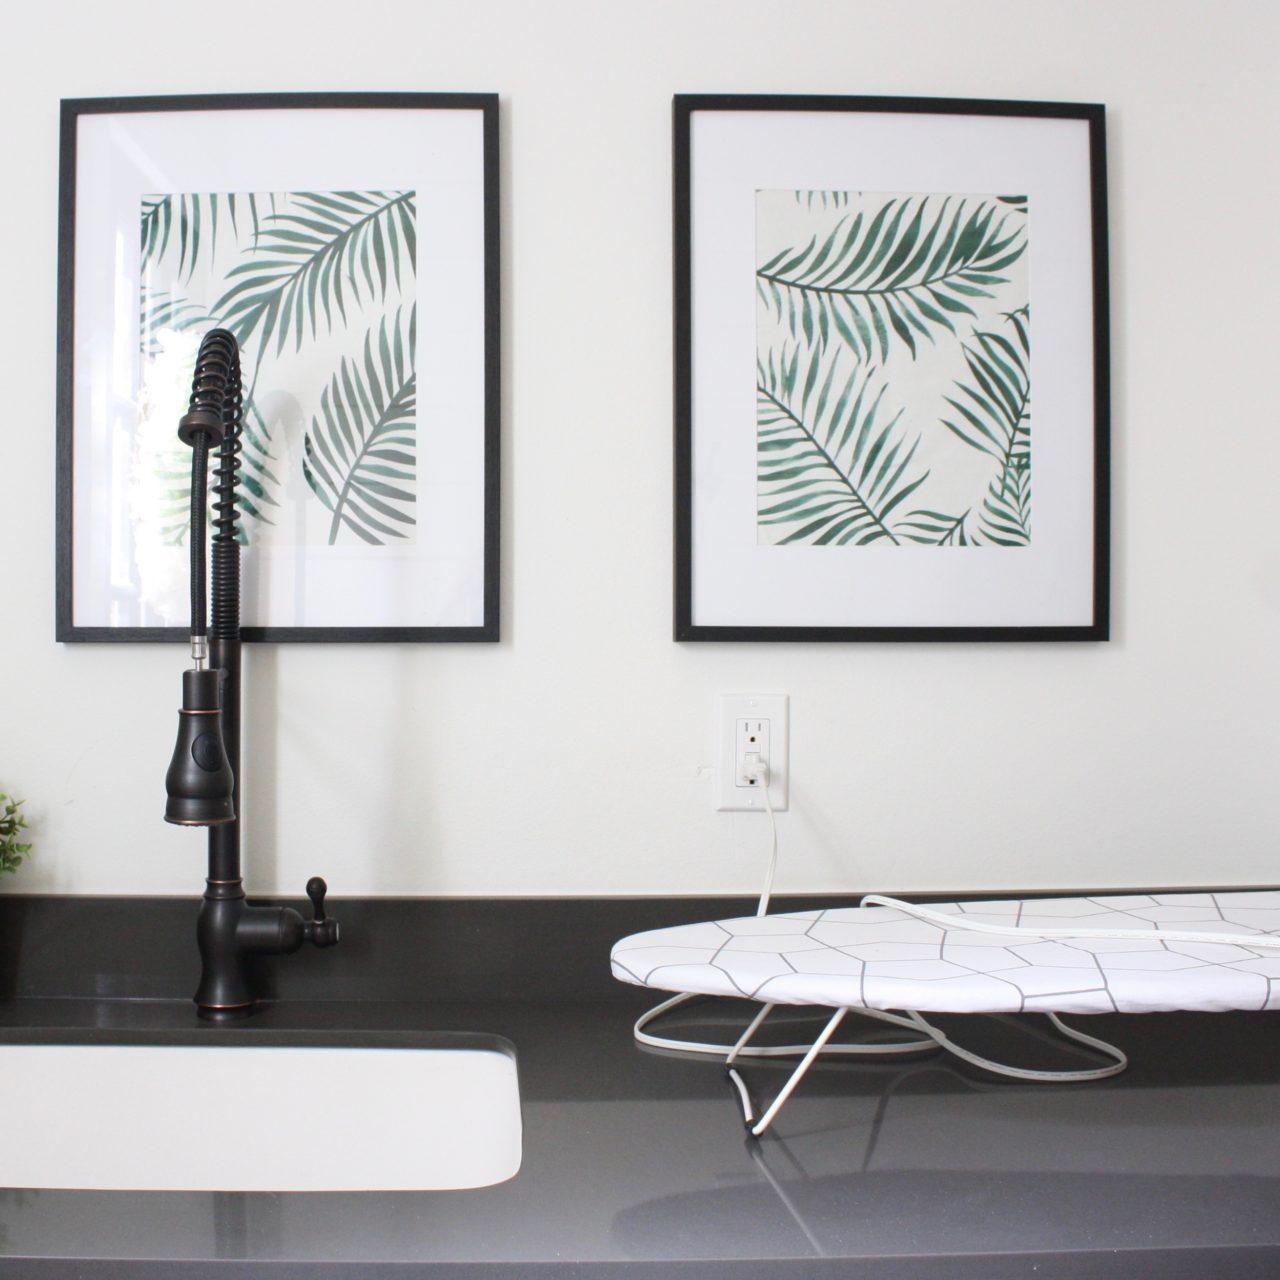 Framed Tea Towel Artwork